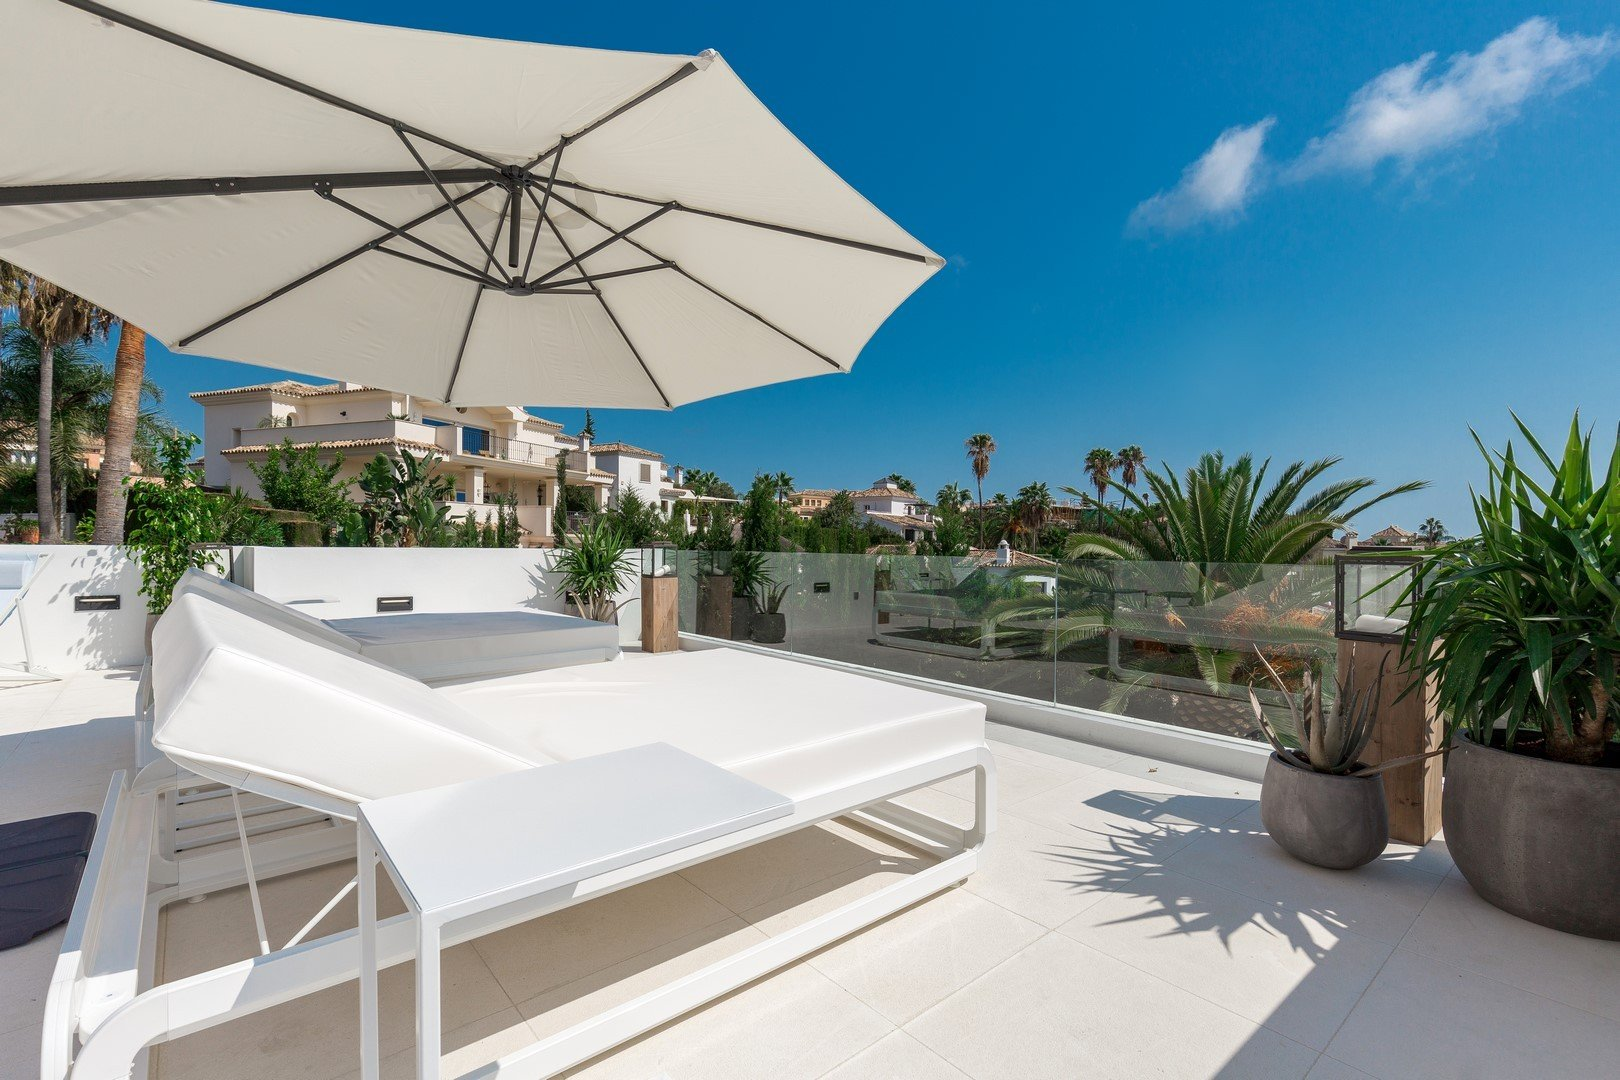 aaa5 bedroom Villa in Nueva Andalucia, Marbella | M314891